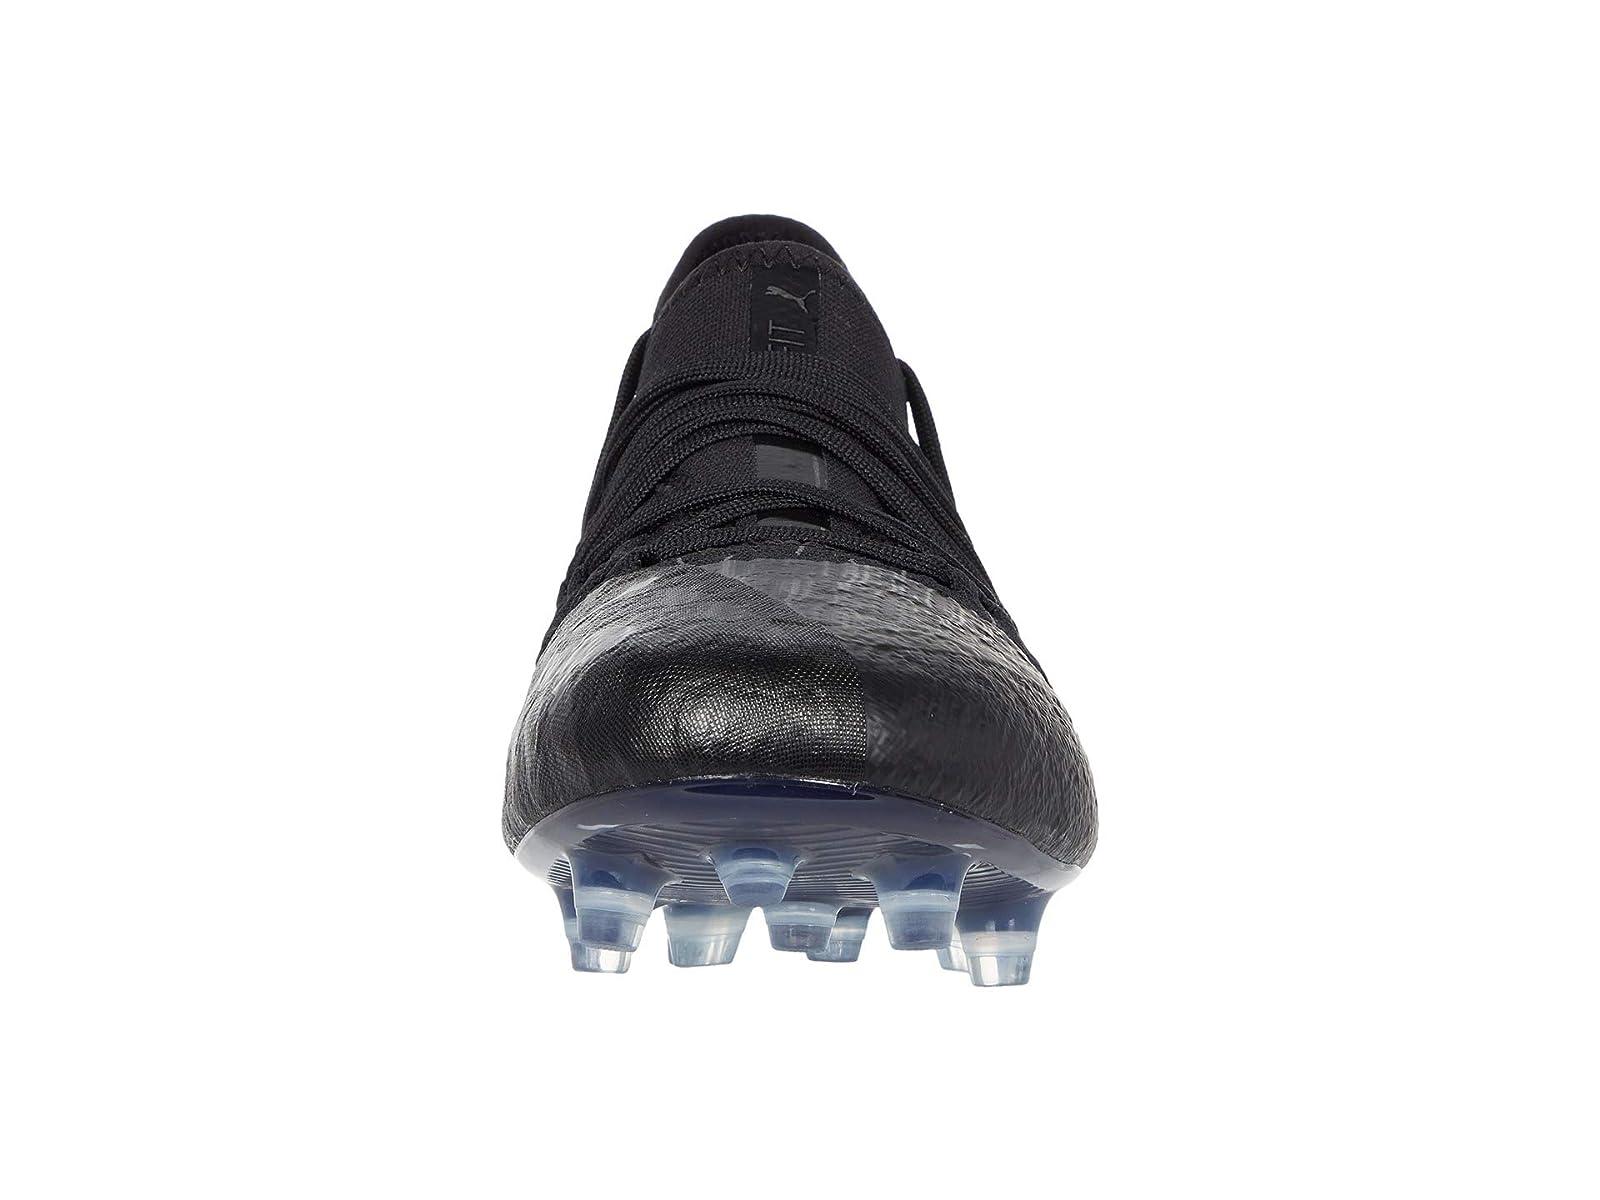 Man-039-s-Sneakers-amp-Athletic-Shoes-PUMA-Future-5-2-Netfit-FG-AG thumbnail 15